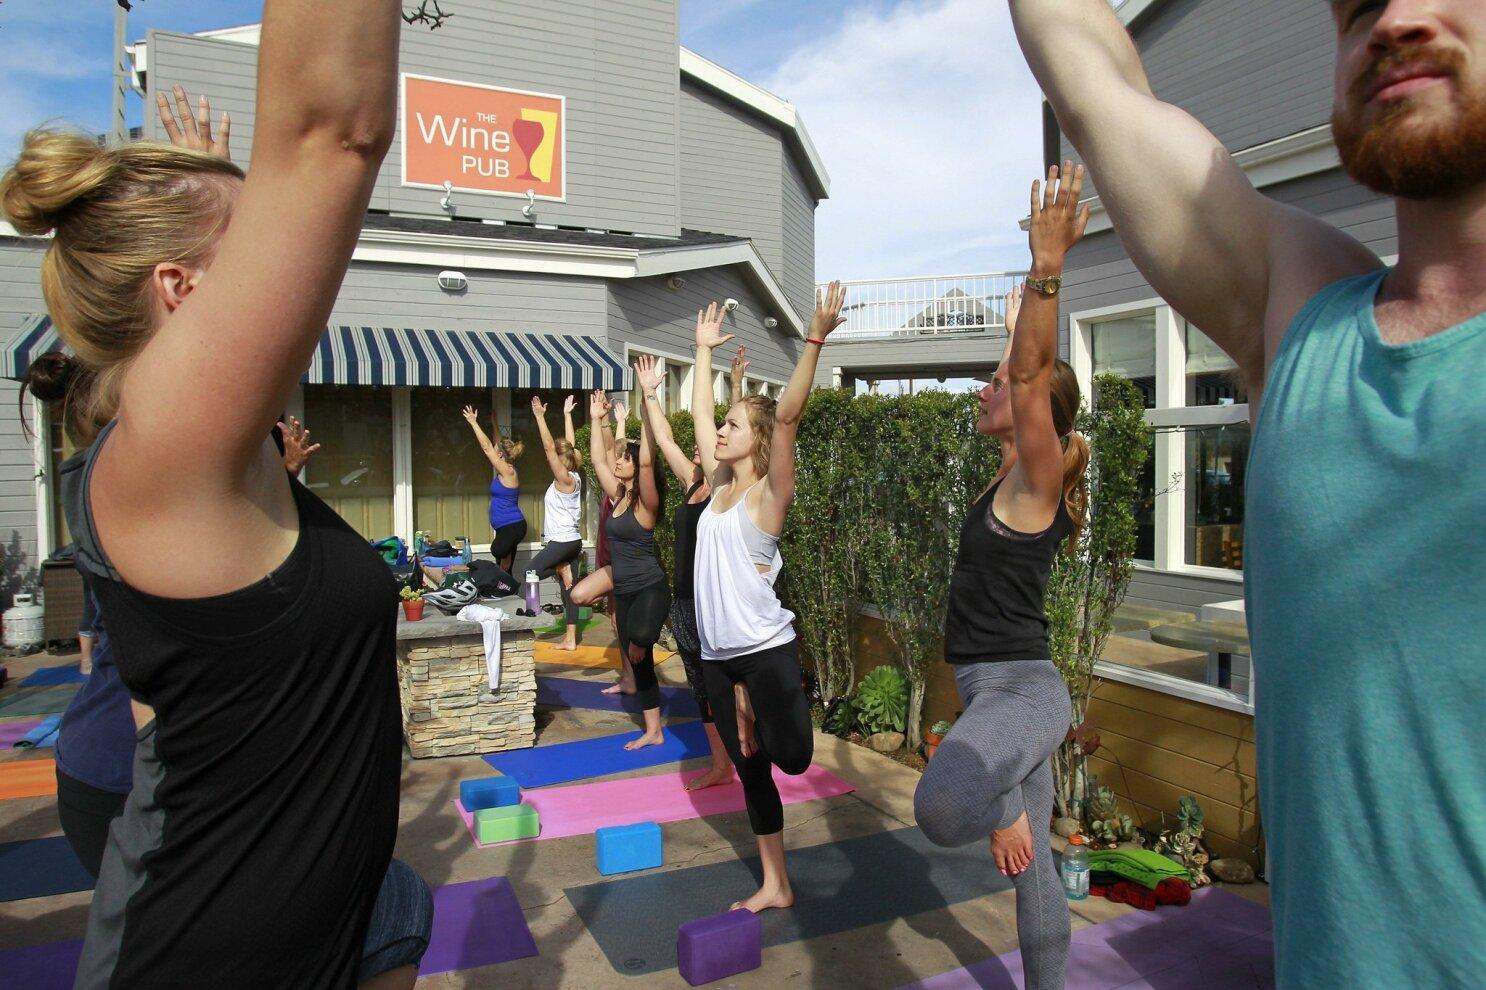 Wine Yoga Classes Come To San Diego The San Diego Union Tribune